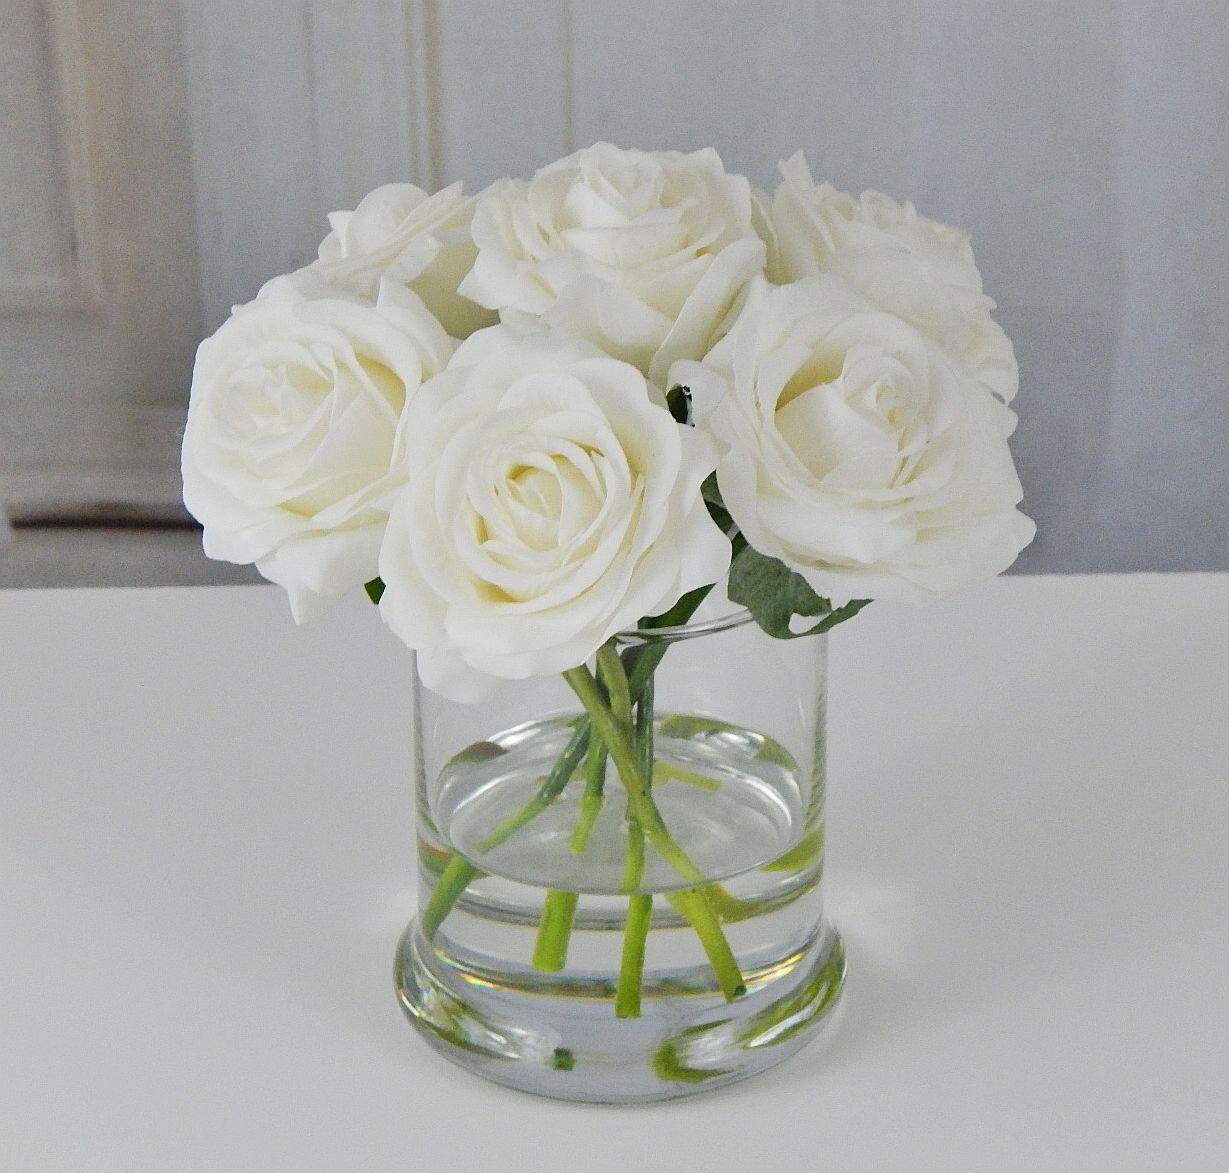 White roseroses glass vase faux water acrylic illusion silk white roseroses glass vase faux water acrylic illusion silk real touch flowers floral arrangement centerpiece home decor mightylinksfo